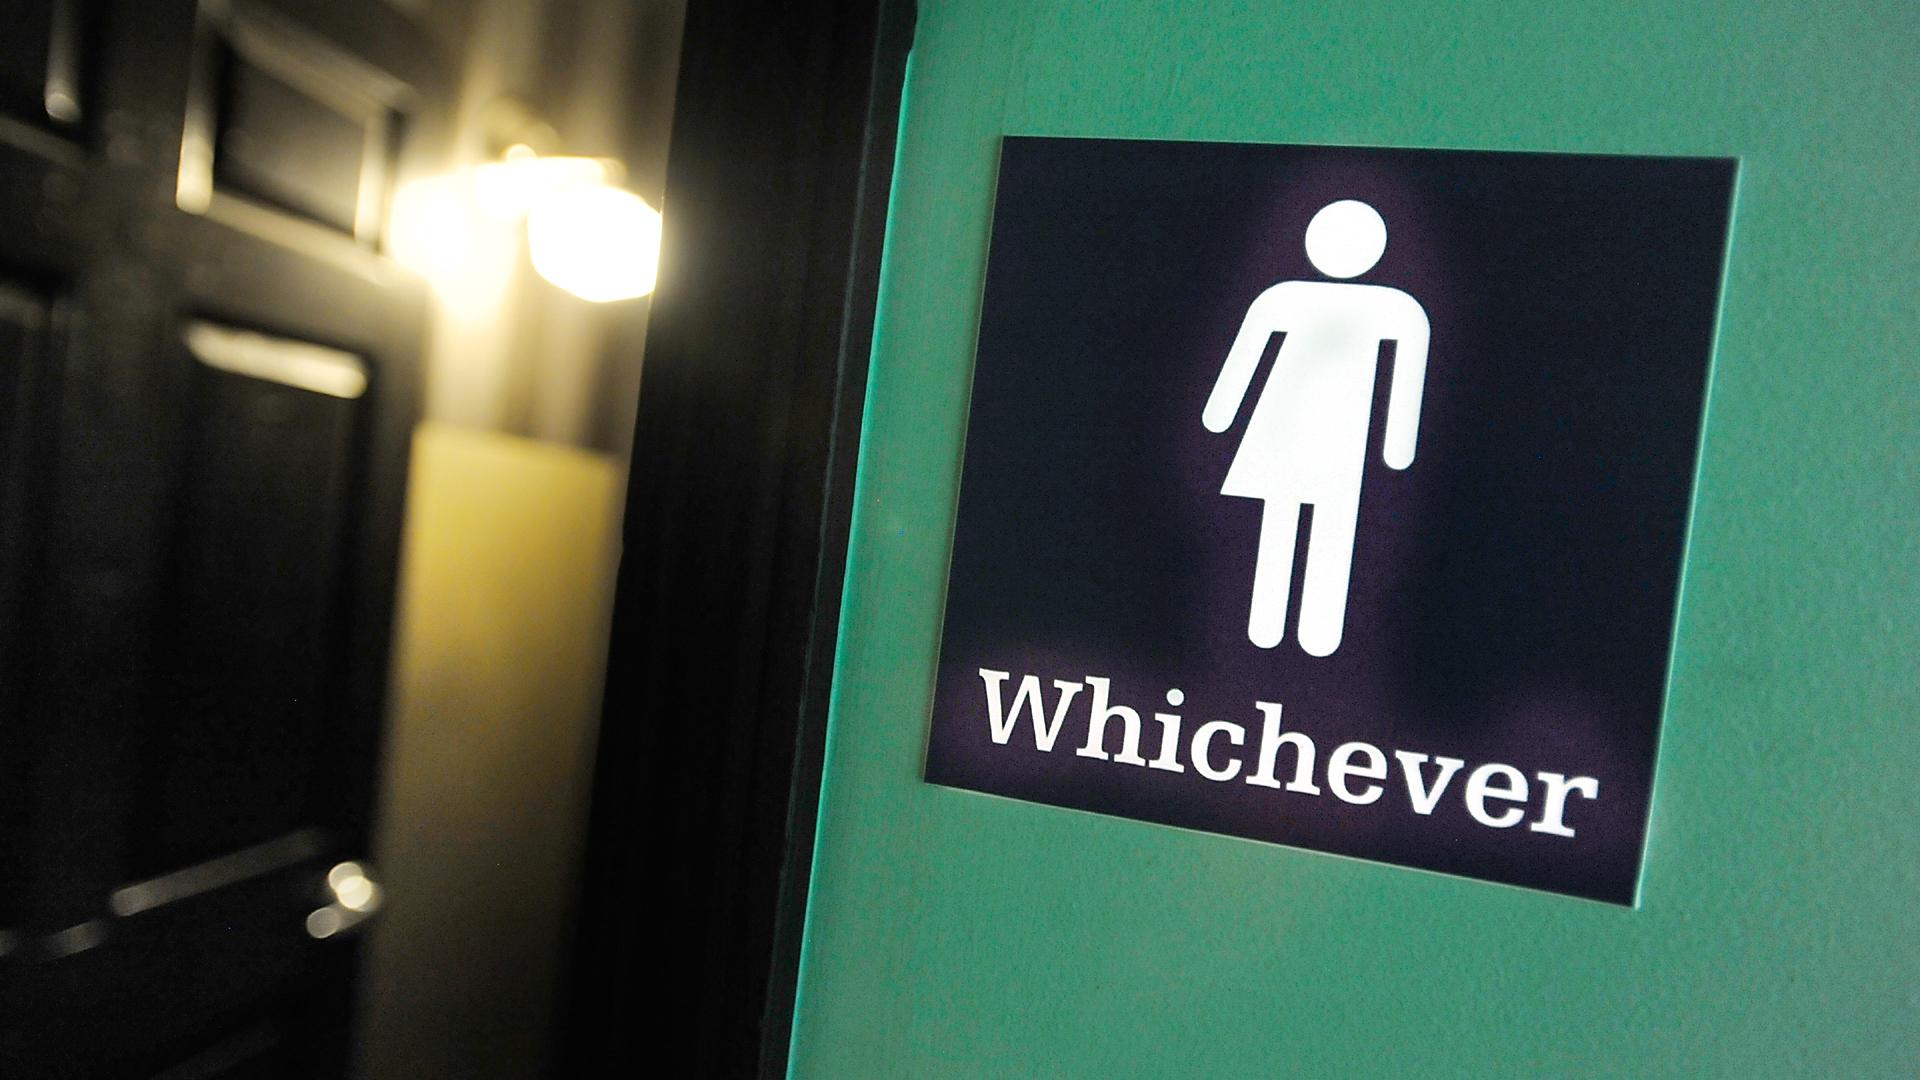 Whichever Bathroom Sign Gender Transgender Bathroom Bill16548258-159532